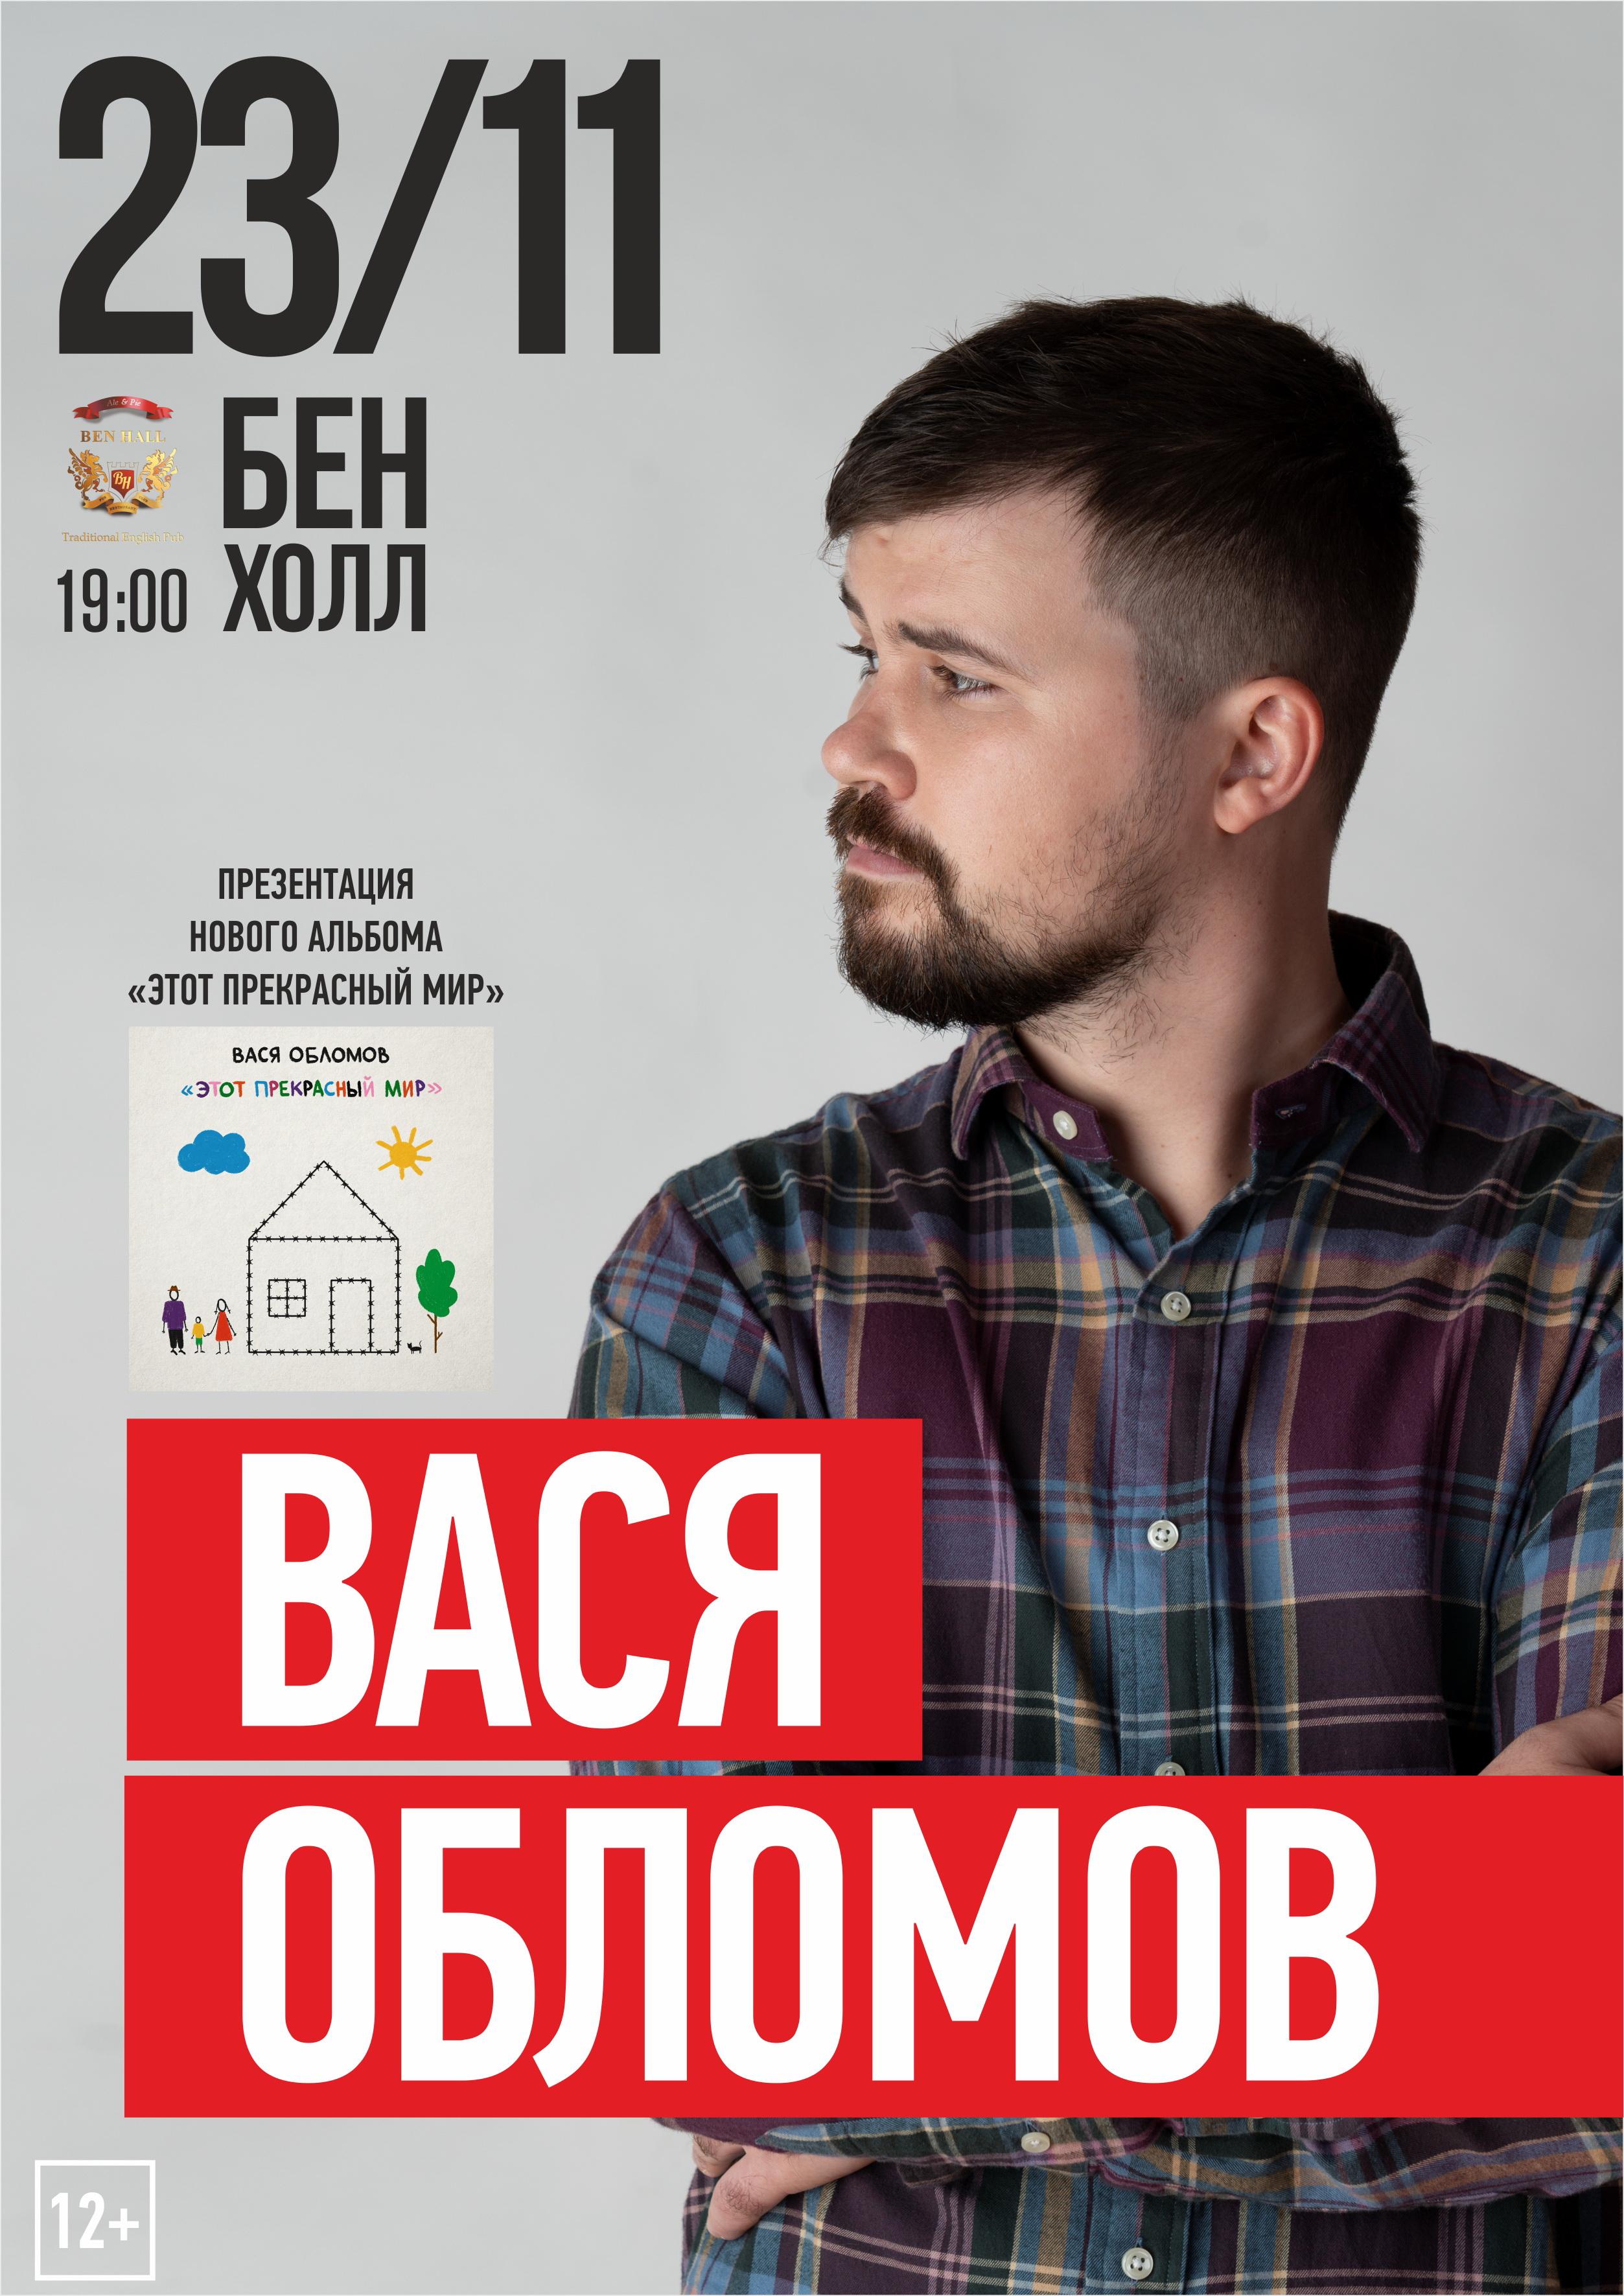 Изображение афиши концерта Васи Обломова предоставлено организаторами